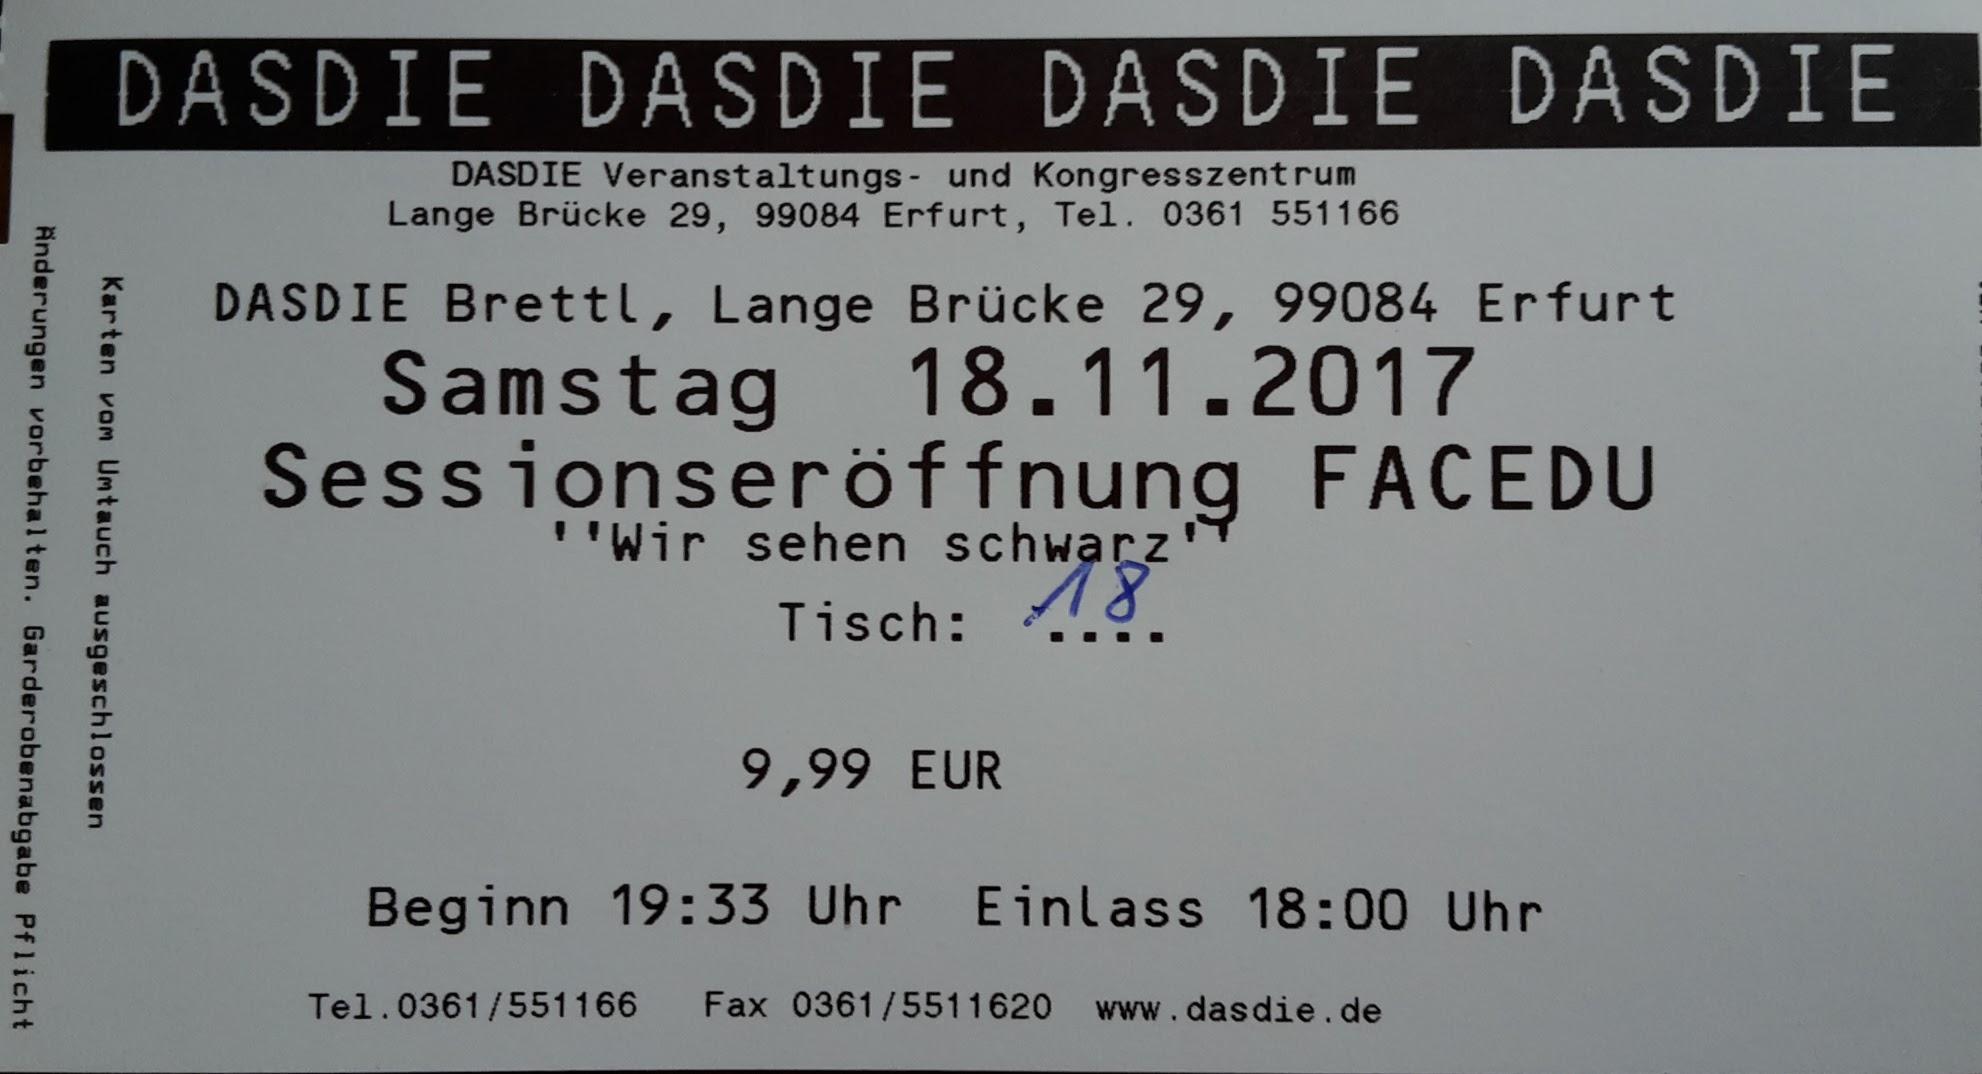 2017.11.18 FaCeDu SessionsEröffnung 01 Ticket